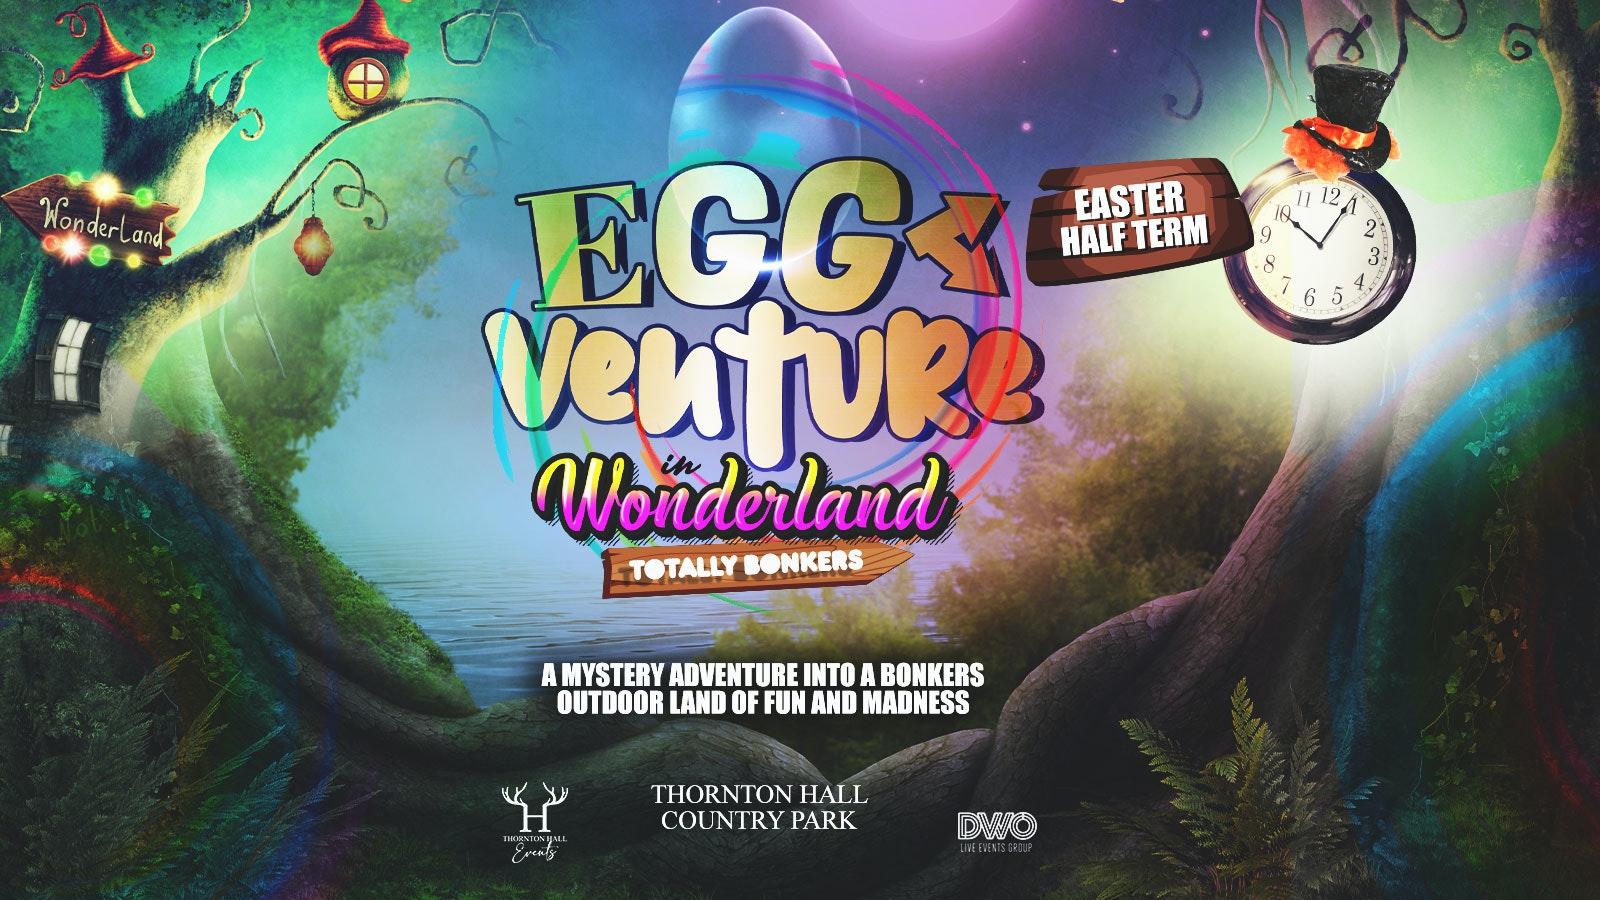 EggVenture in Wonderland – Friday 9th April – 12noon